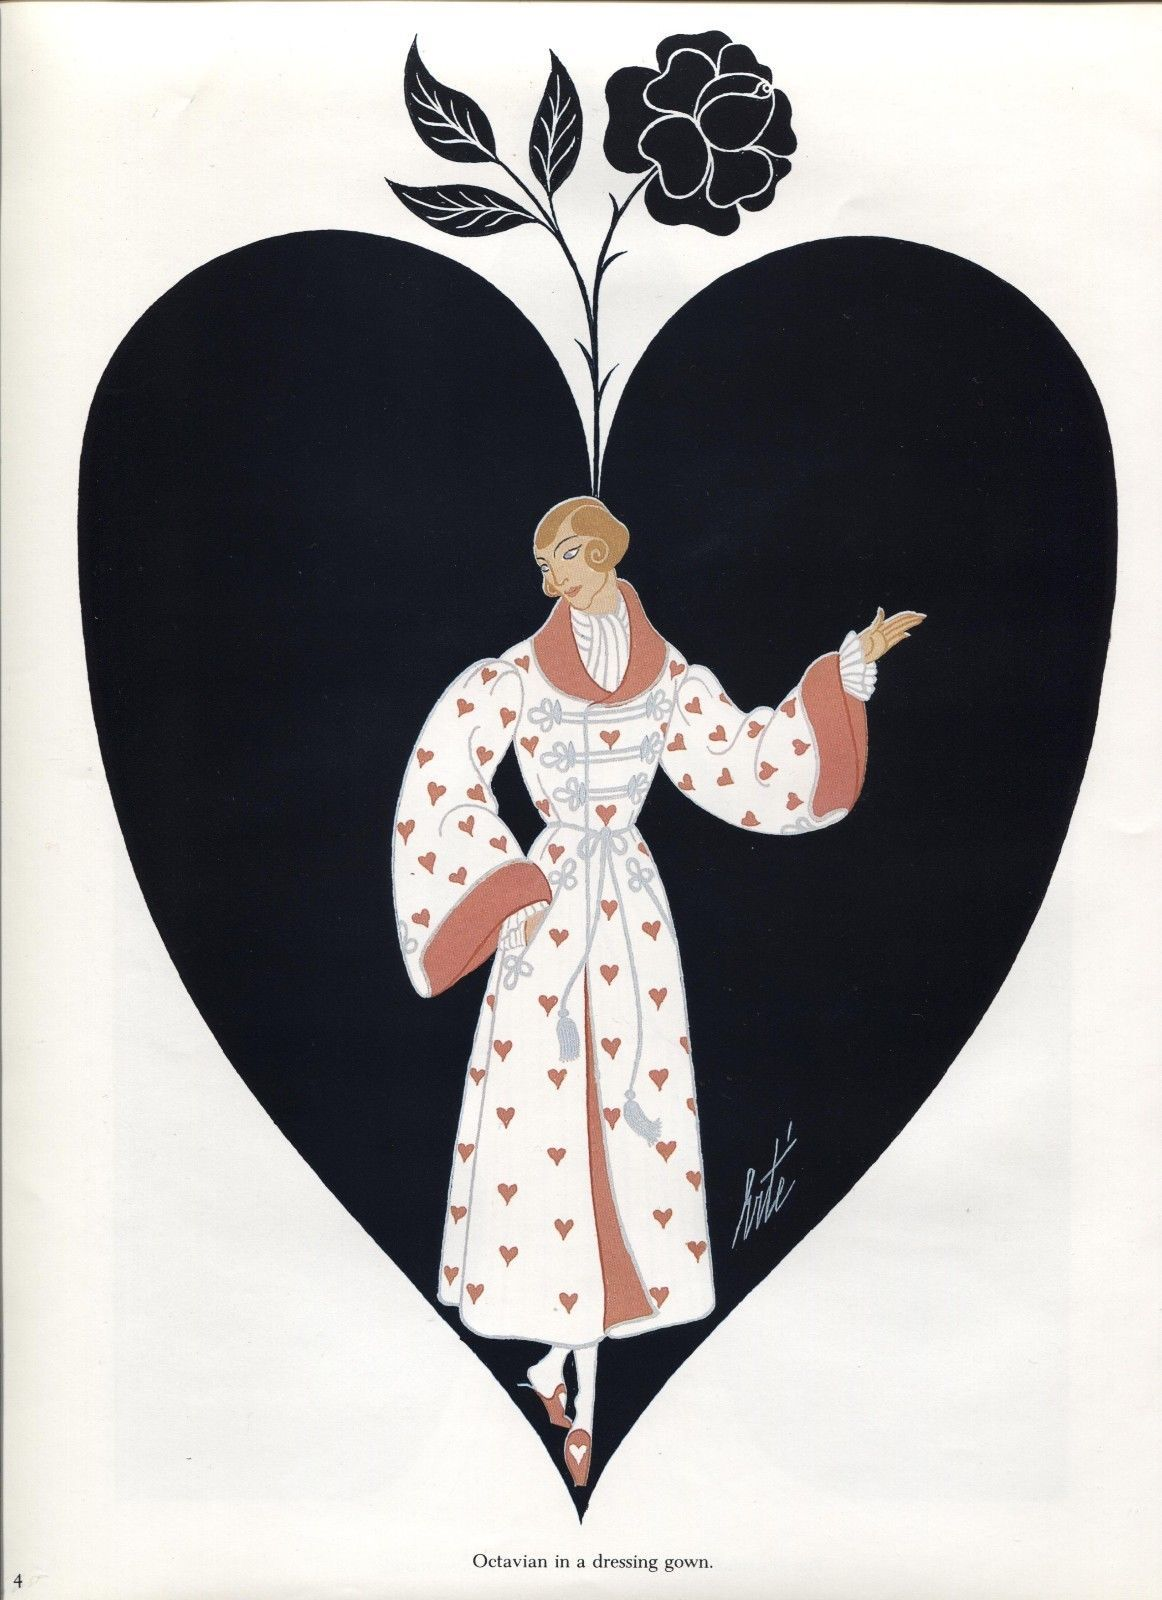 Erte, Octavian 2, Der Rosenkavalier Costume design. Vintage 1980 Art Deco print